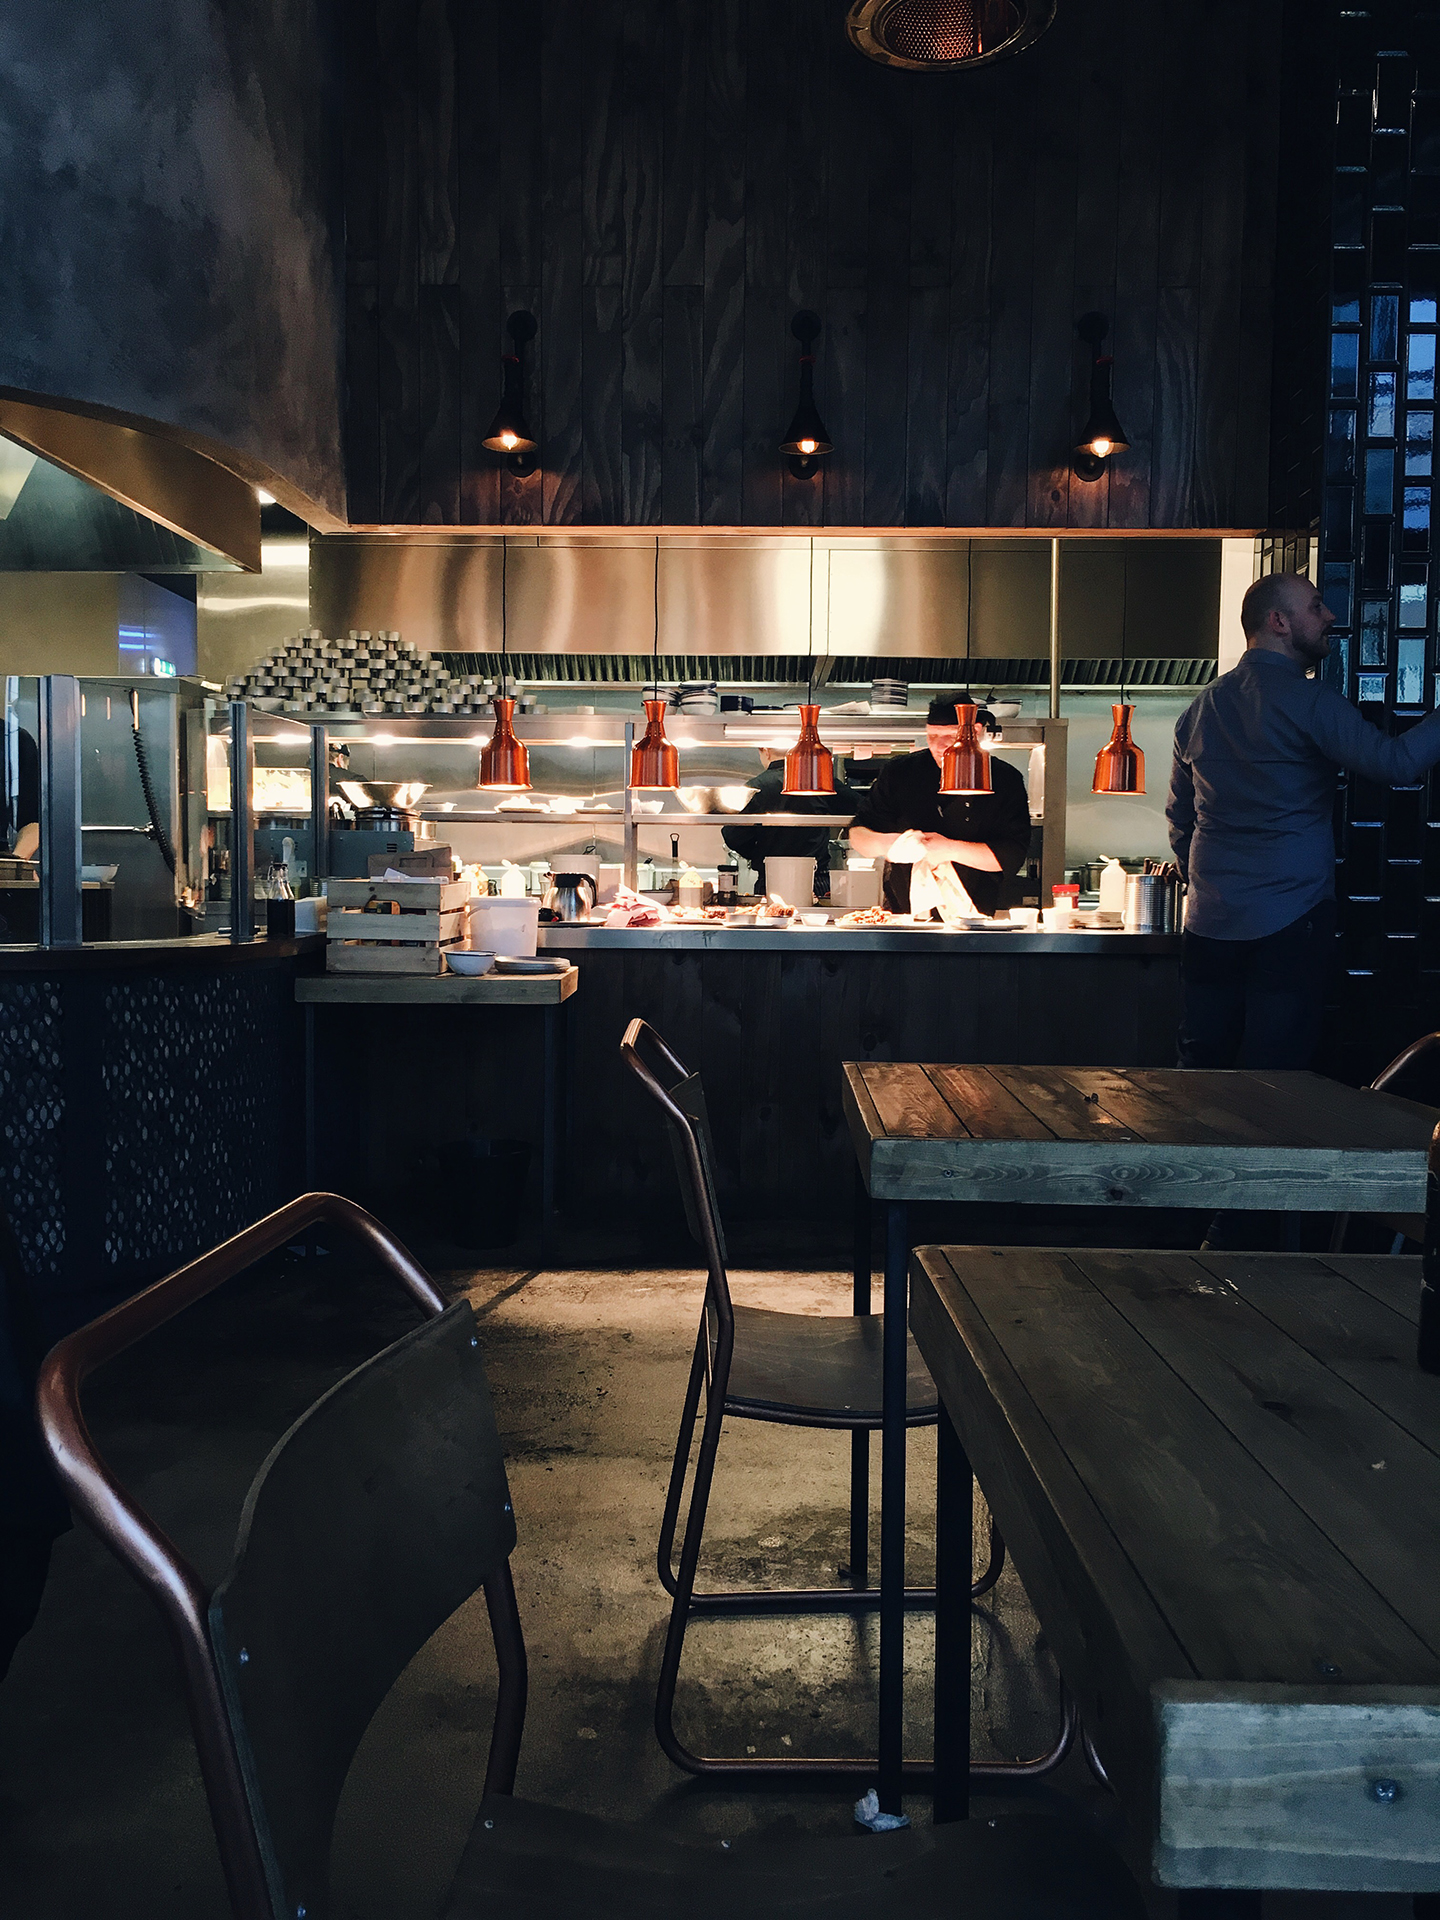 smoke bbq interior kitchen